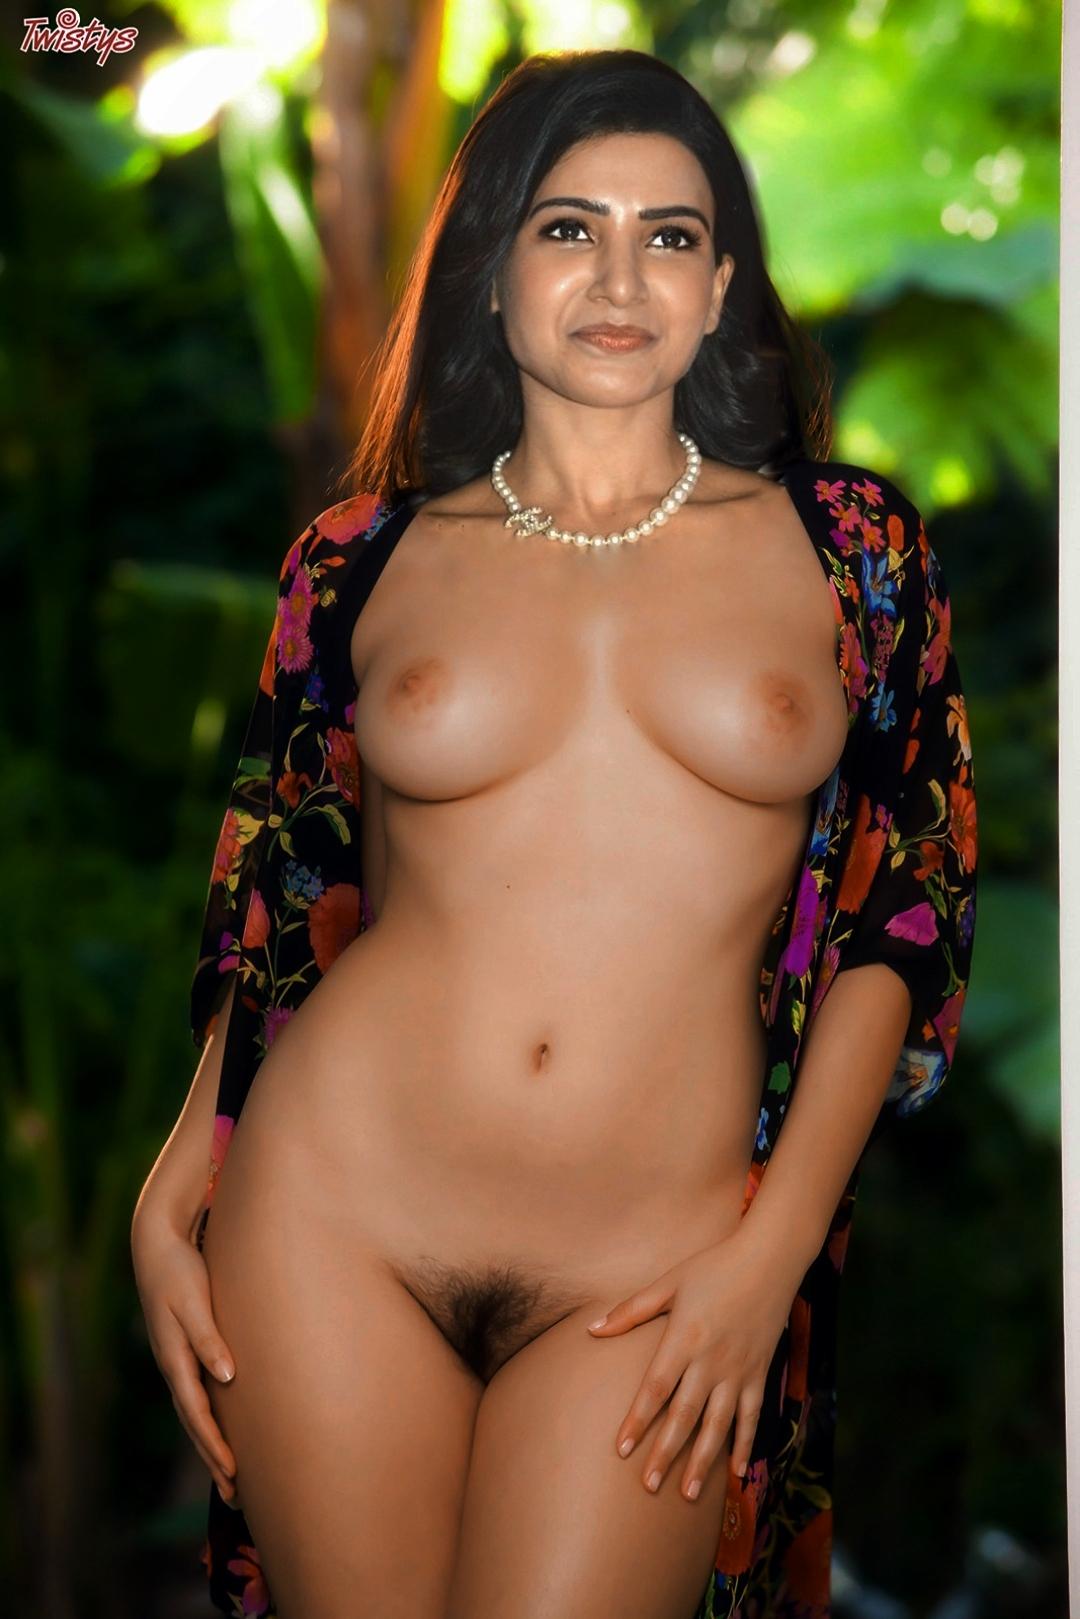 Samantha nude